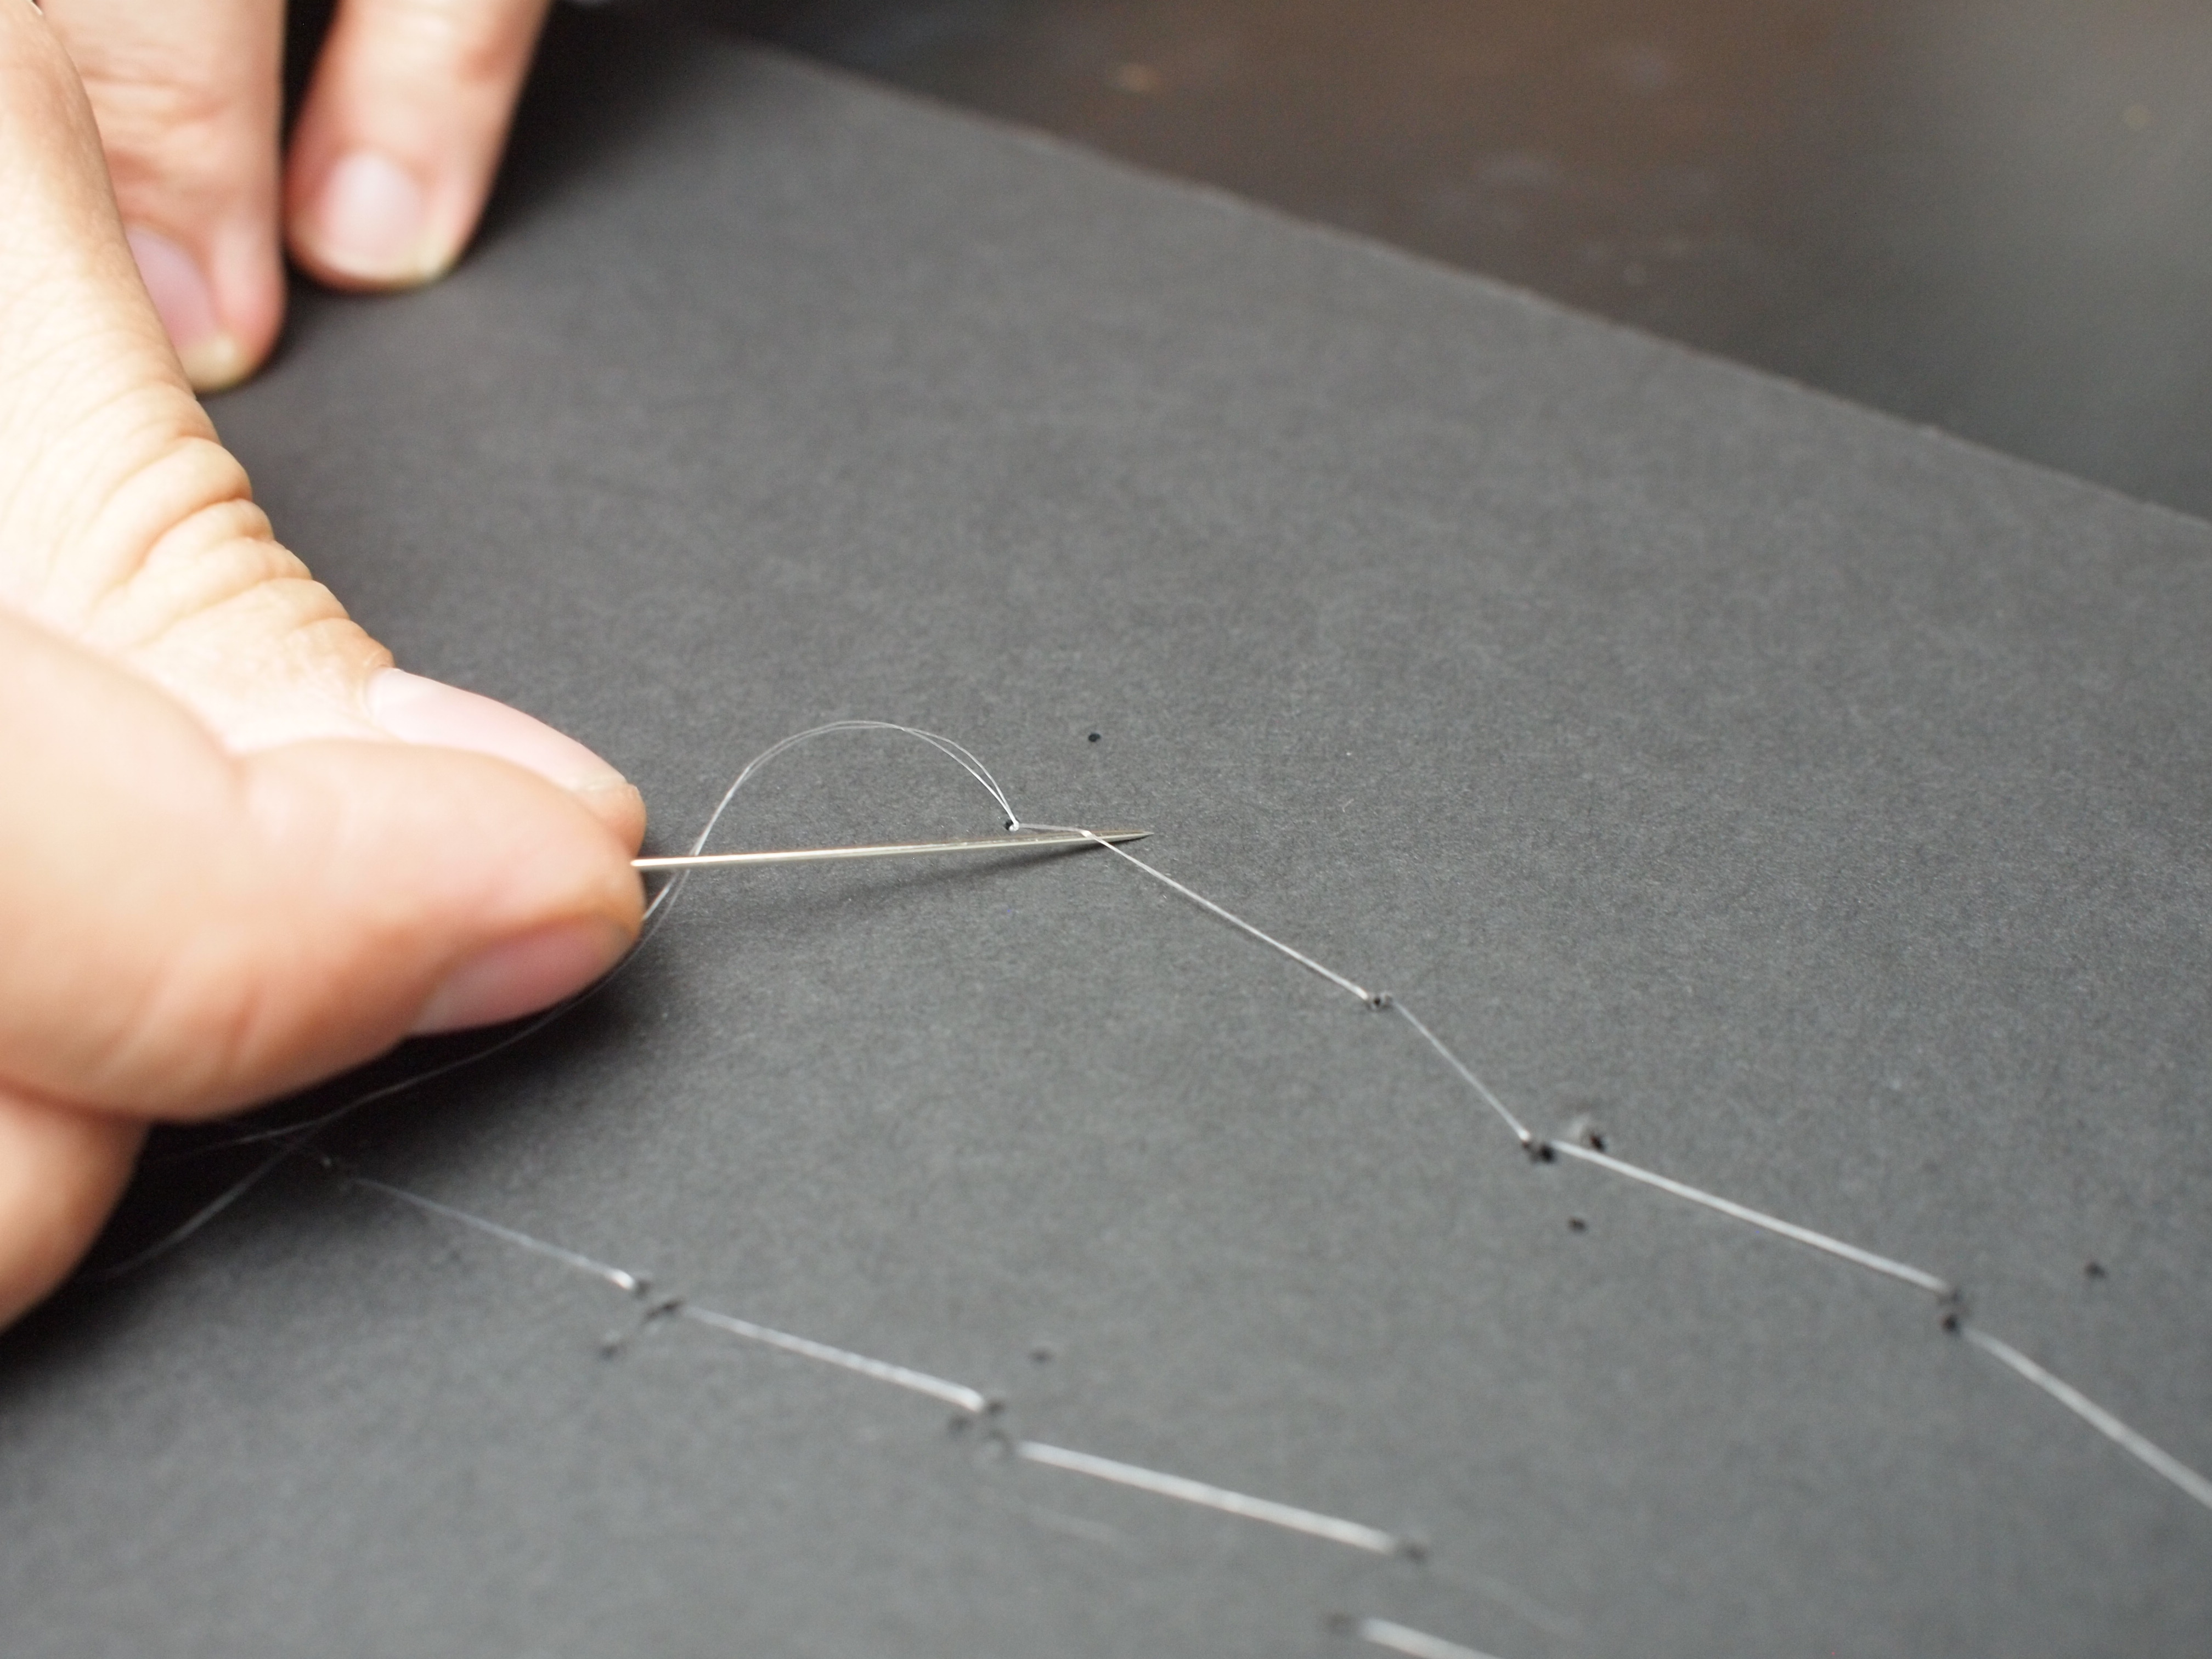 el_wire_tape_panel_tie_it_off.jpg